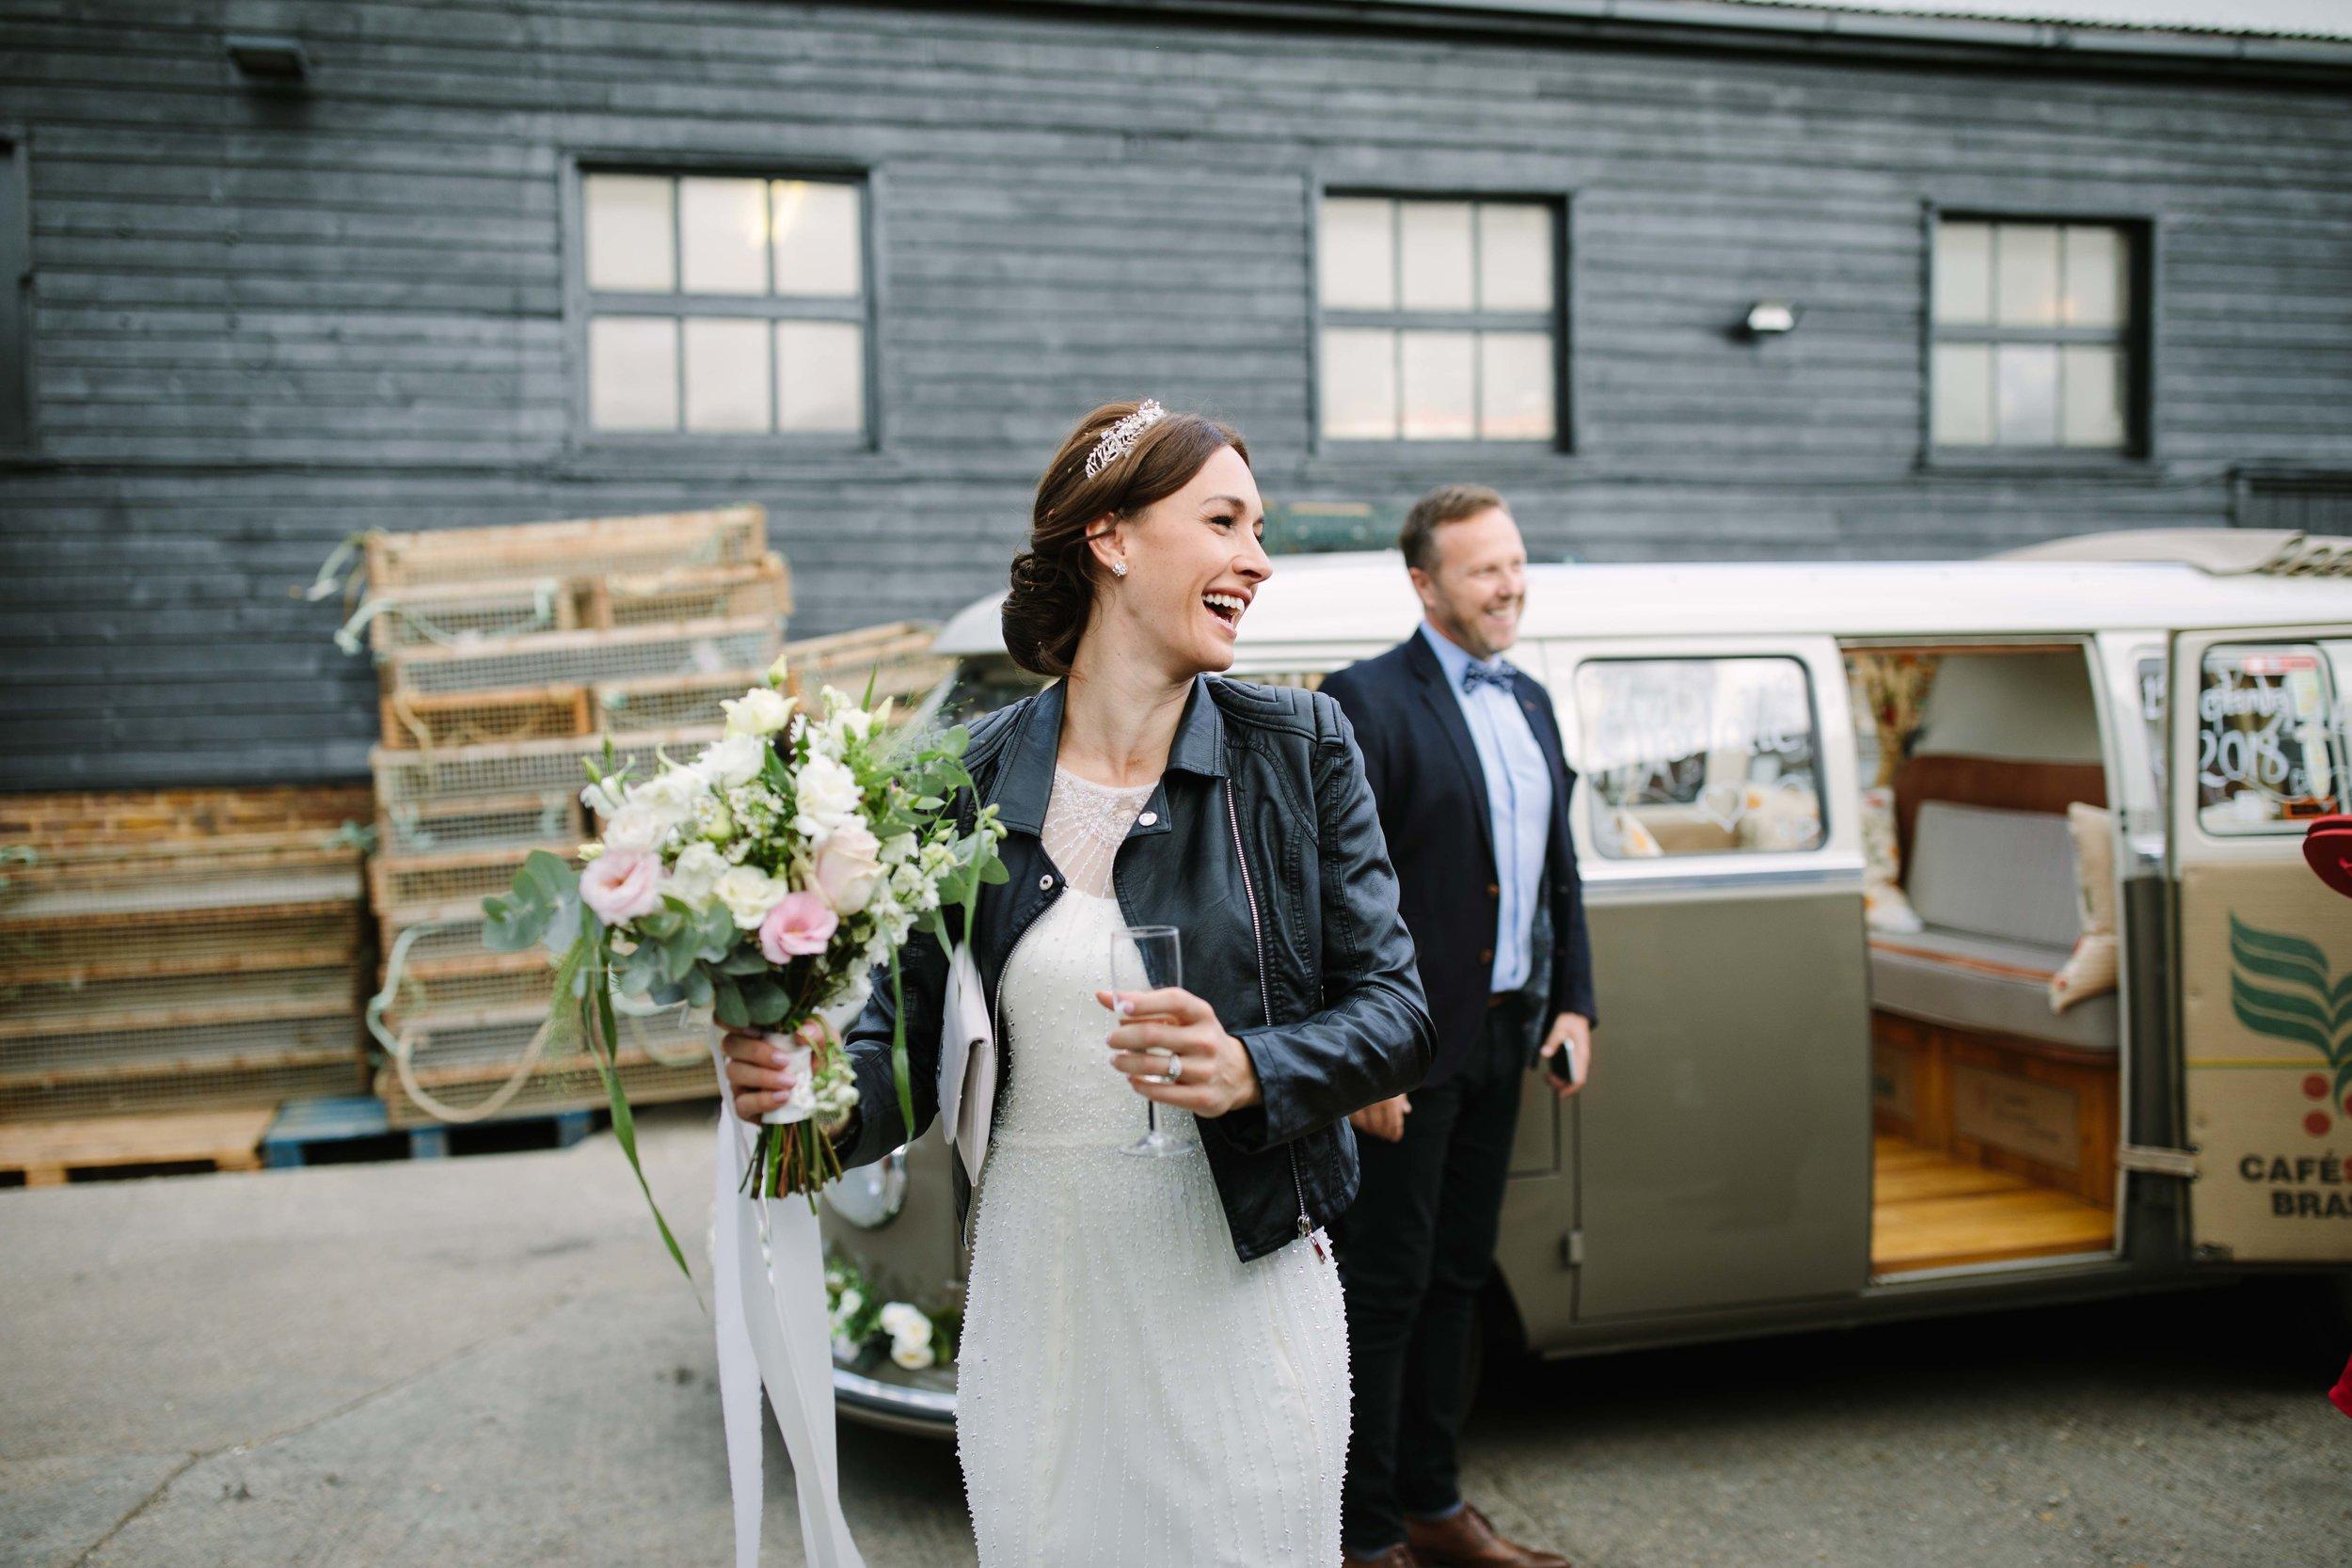 East Quay Wedding Photographer Charlotte & Mark-47.jpg